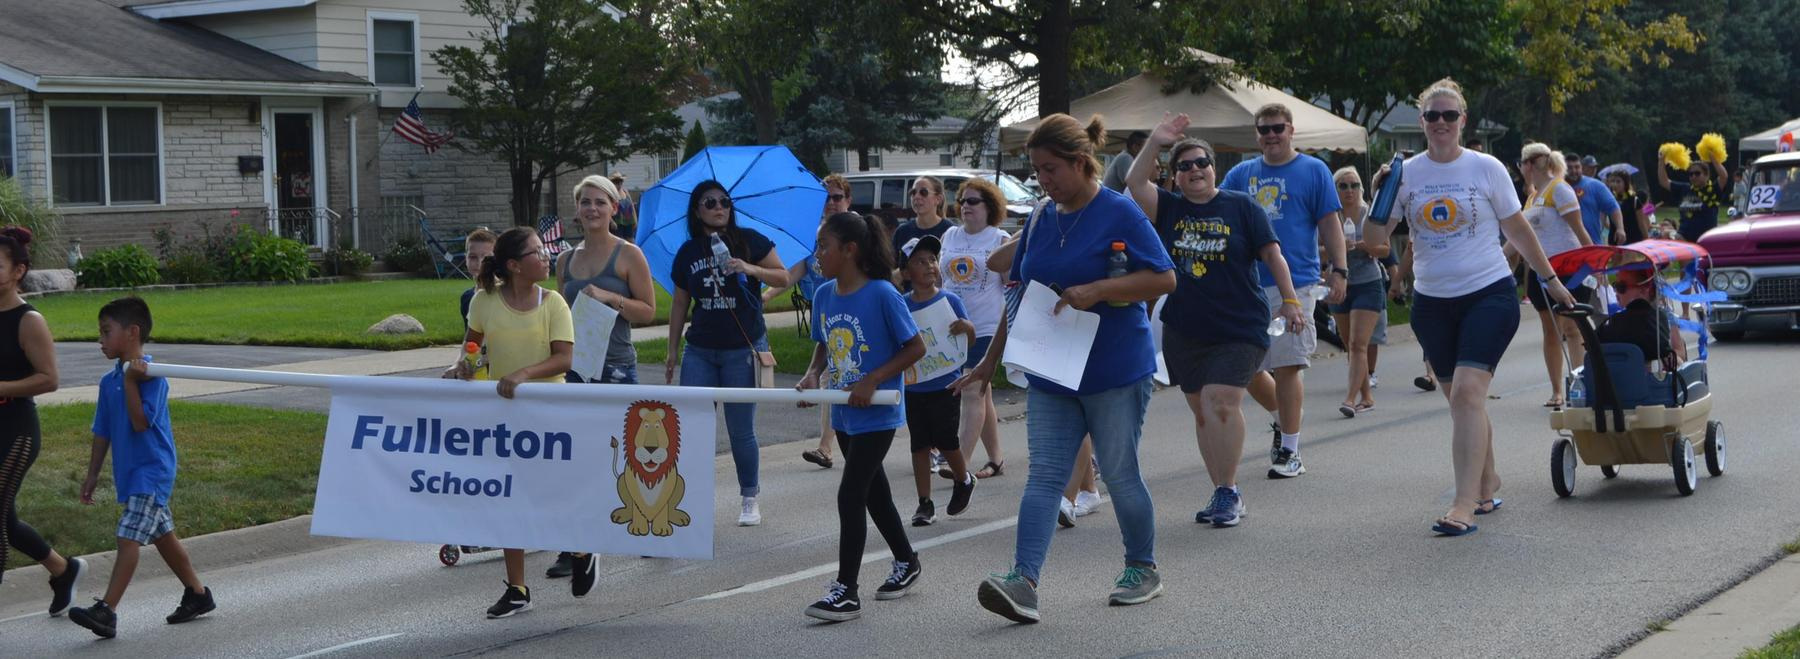 Fullerton in parade